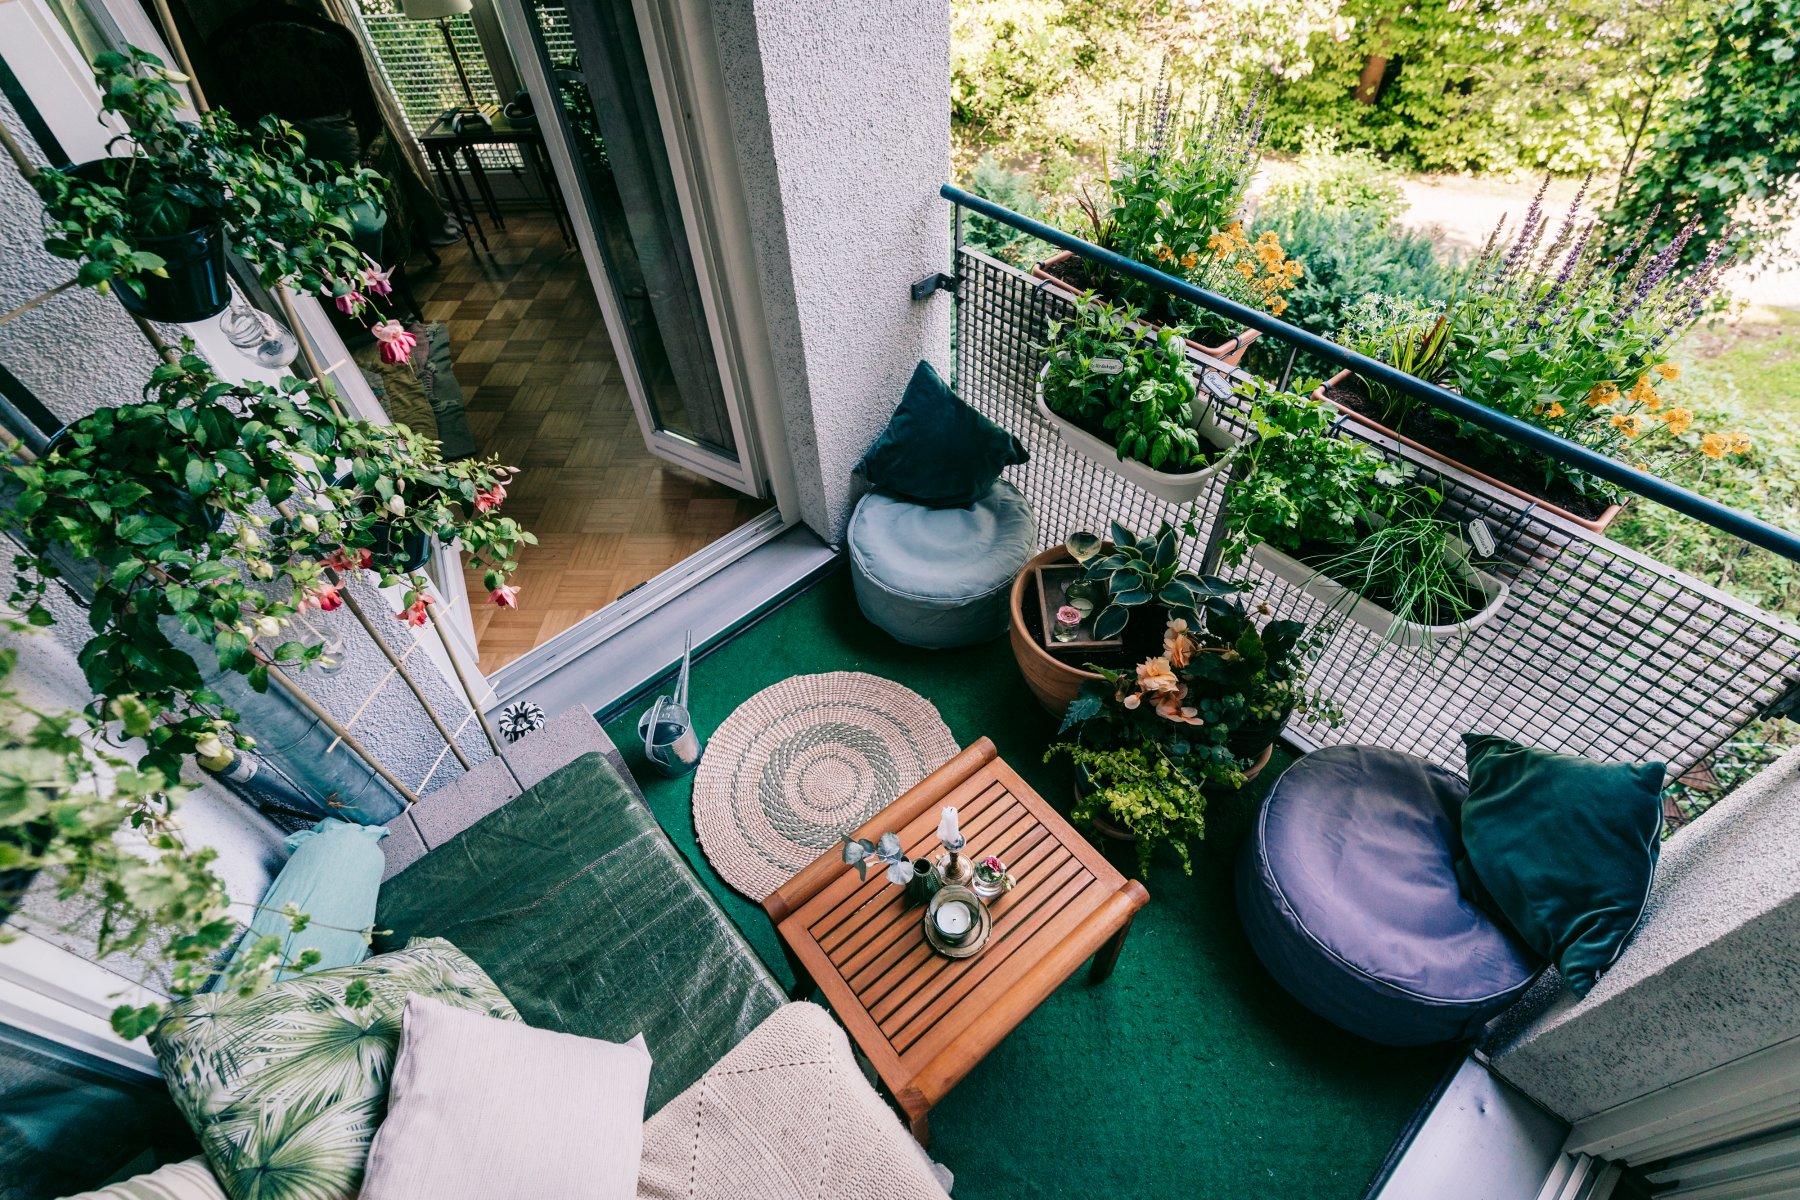 Geheimtipp Muenchen Interieur Gartencenter Seebauer Balkon MB 17 – ©wunderland media GmbH